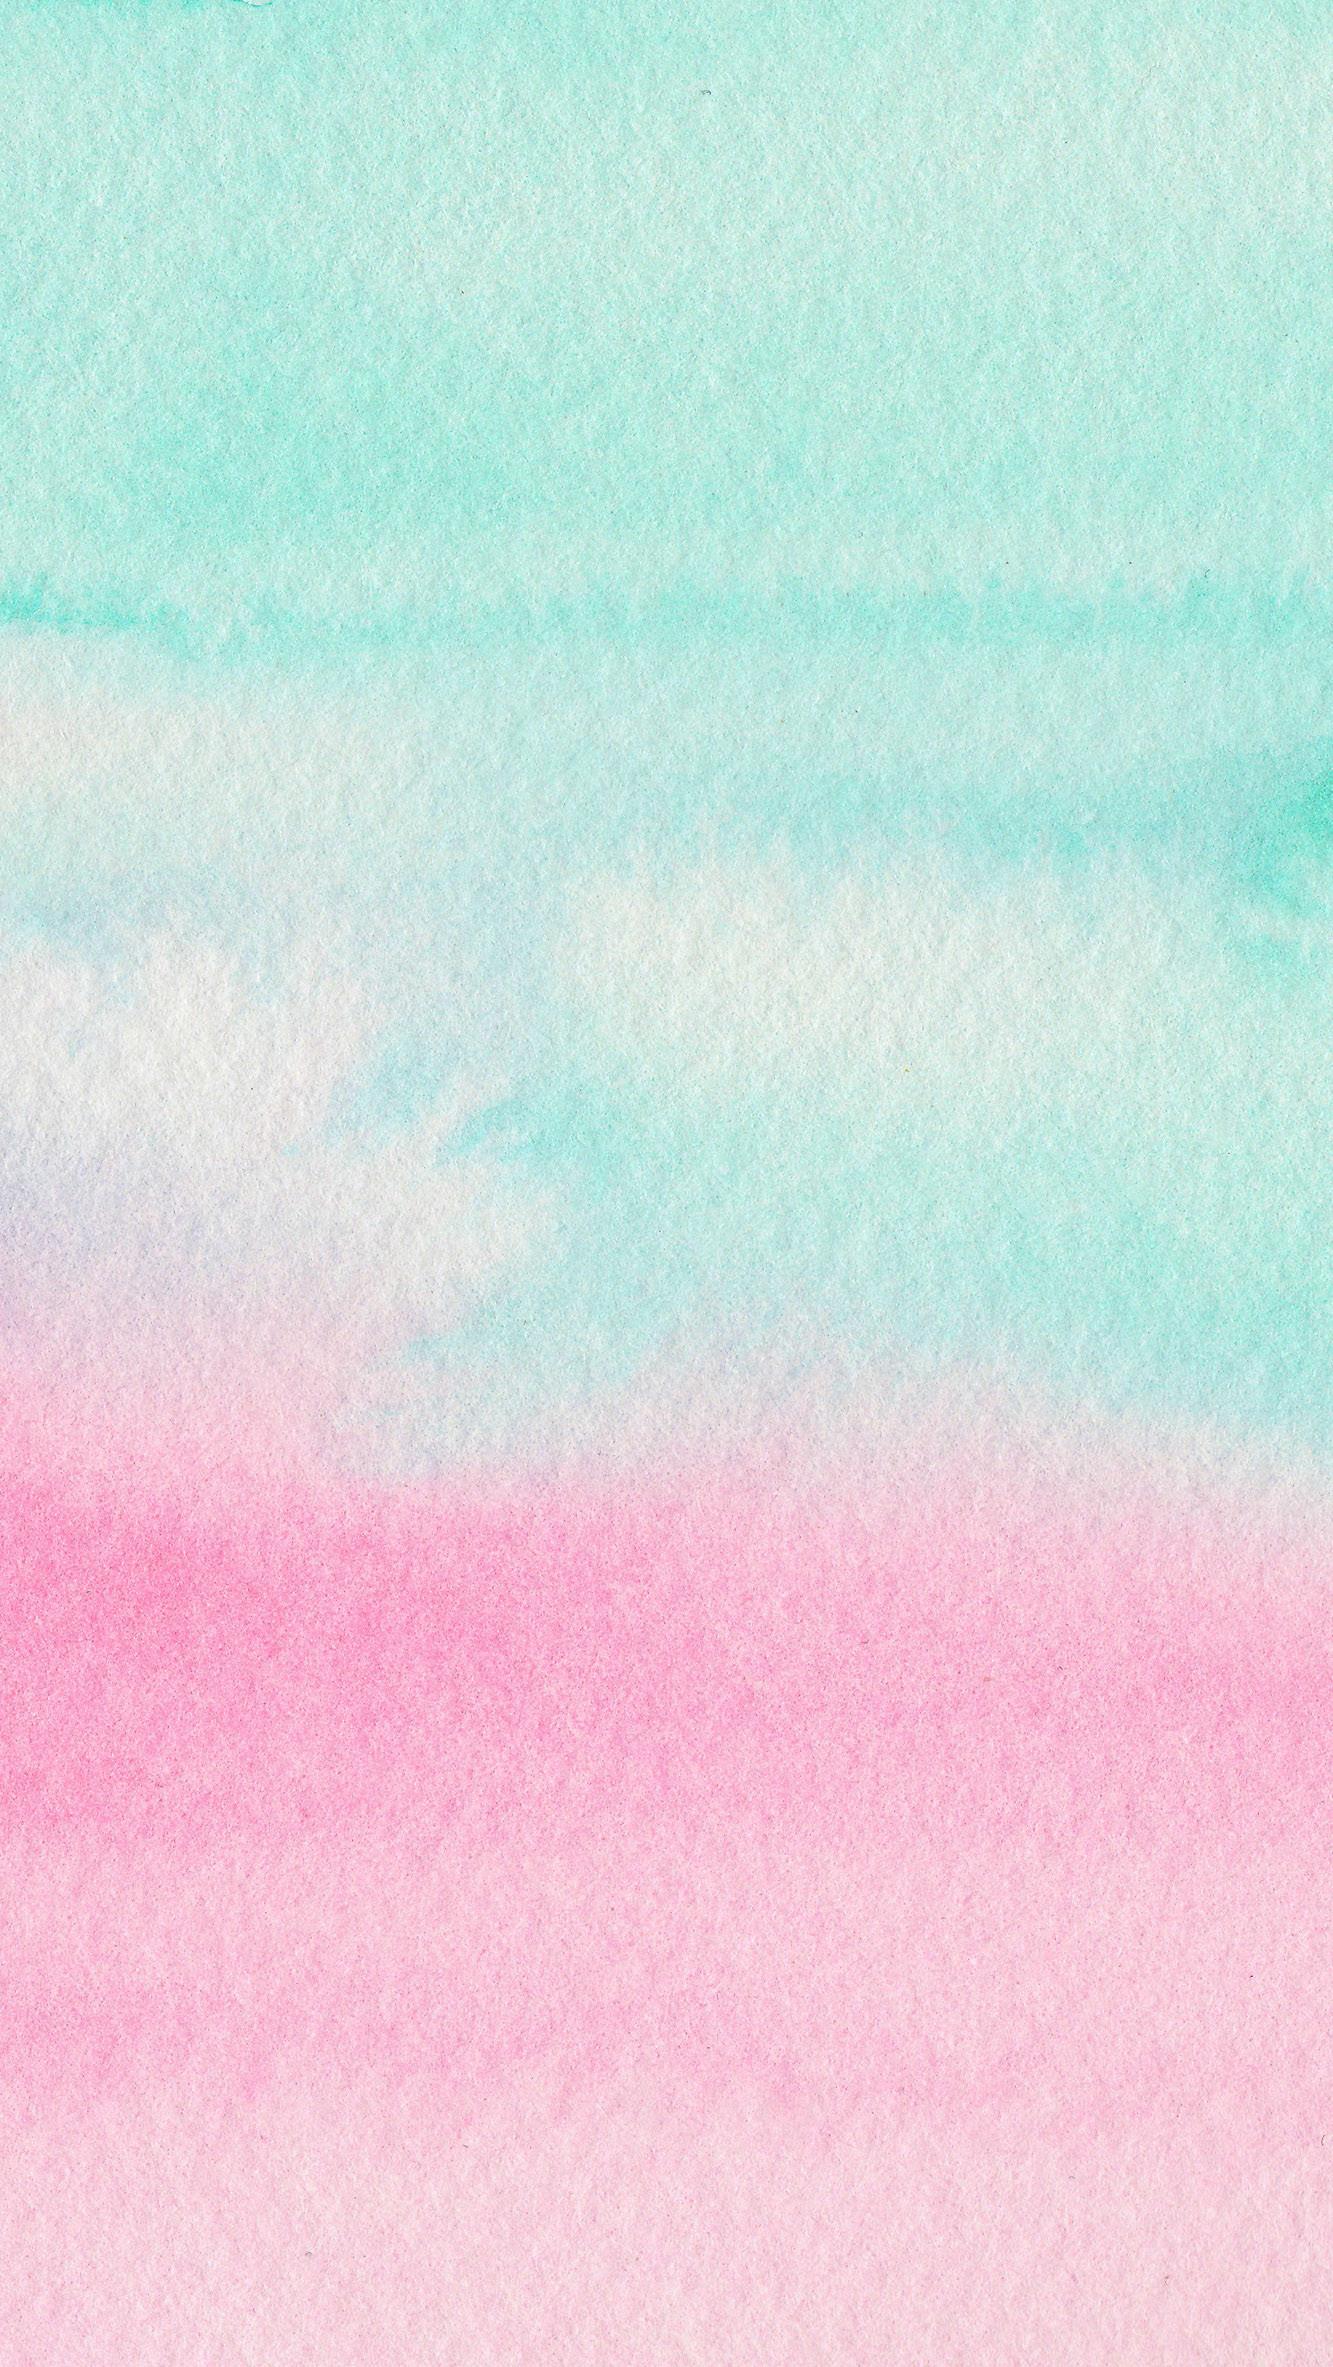 Mint Aqua pink watercolour ombre texture iphone wallpaper phone background  lock…